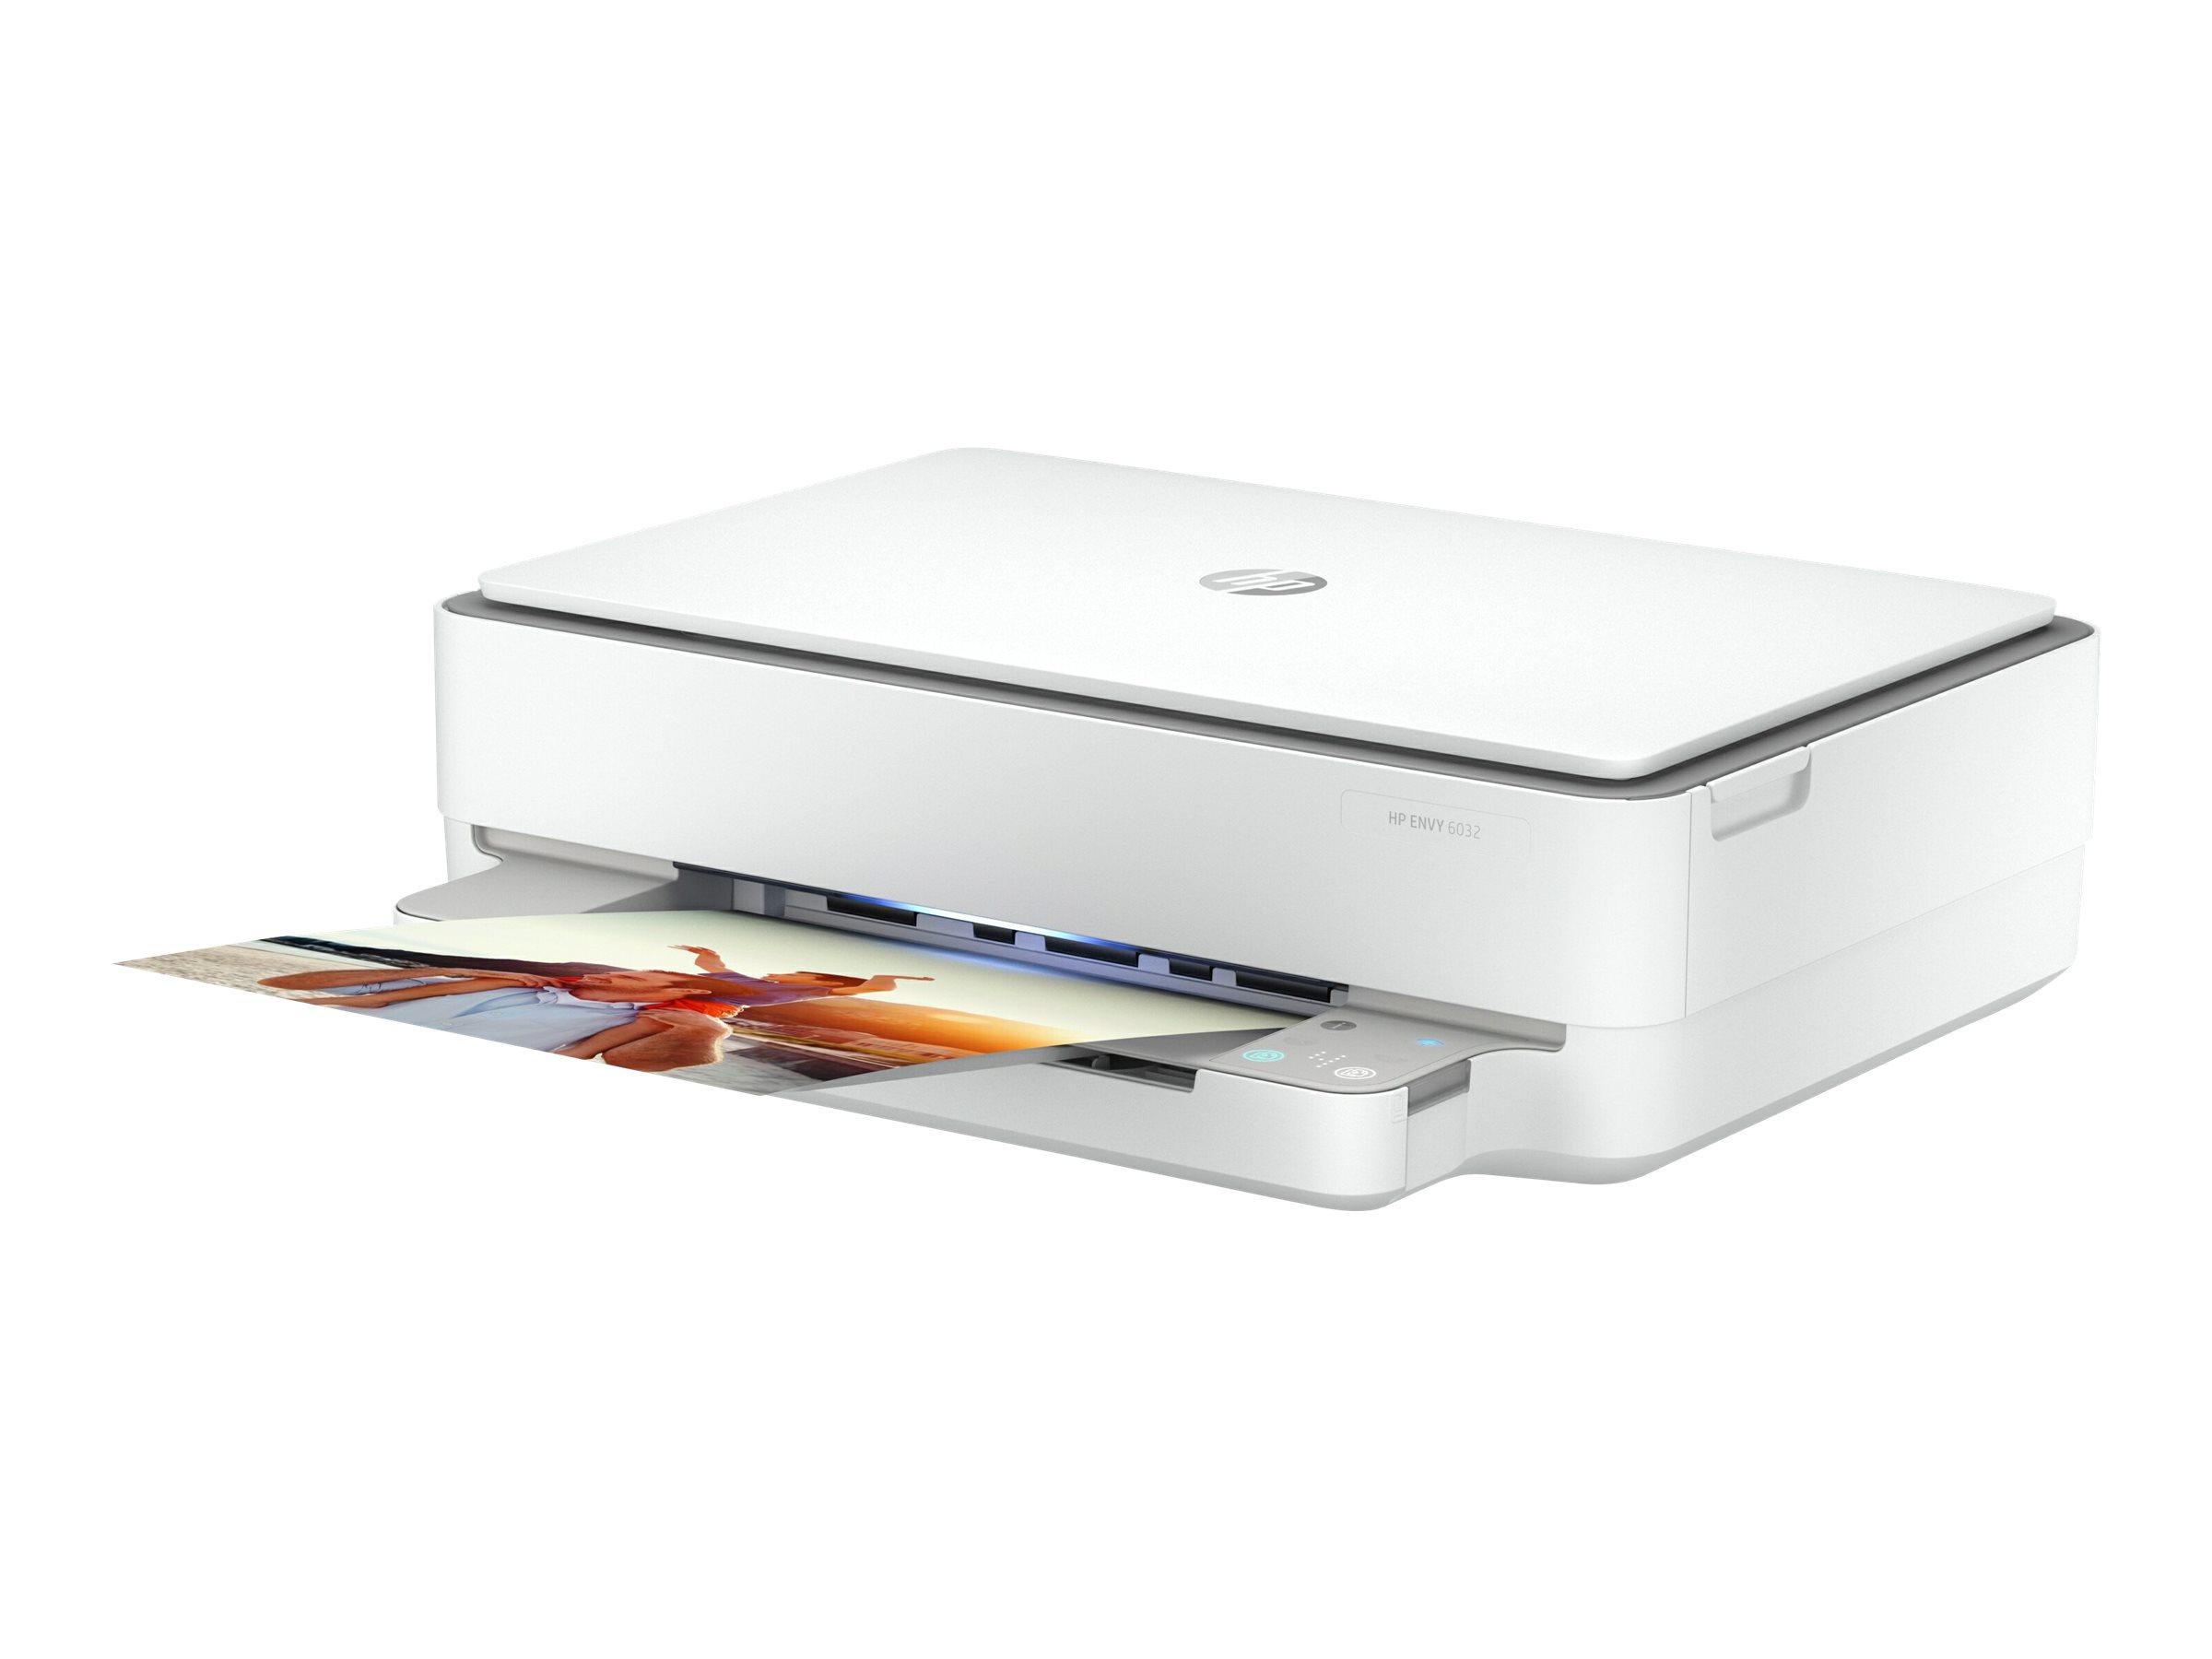 HP Envy 6032 All-In-One - Multifunktionsdrucker - Farbe - Tintenstrahl - 216 x 297 mm (Original) - A4/Letter (Medien)